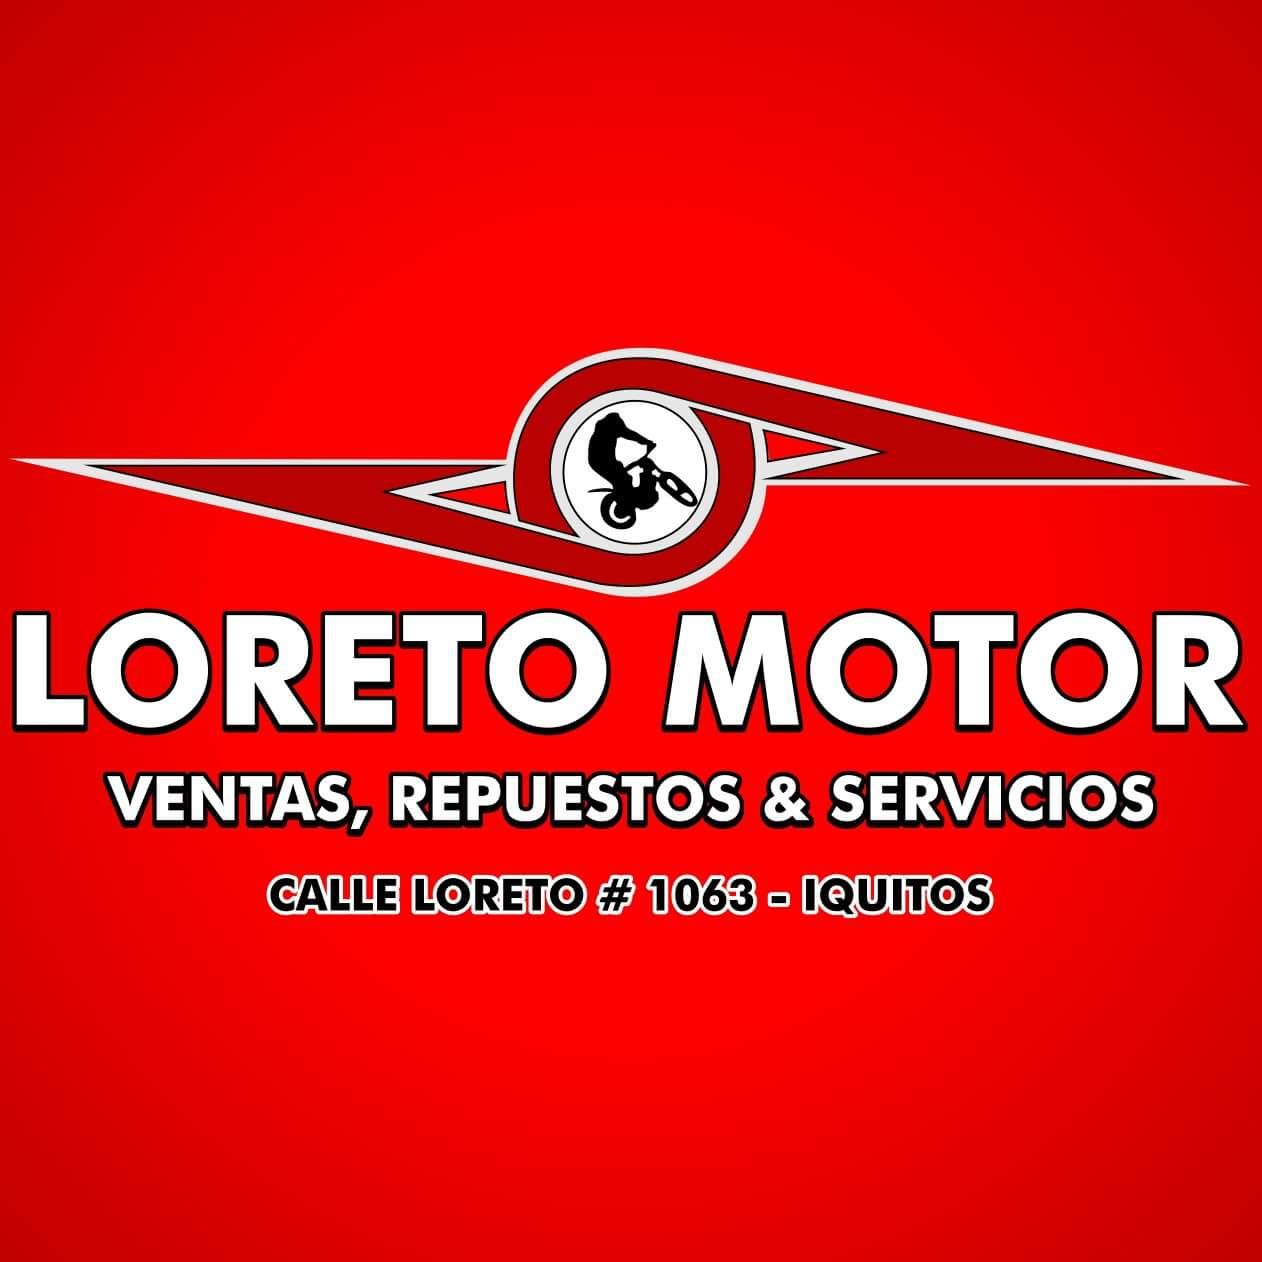 Loreto Motor Sucursal